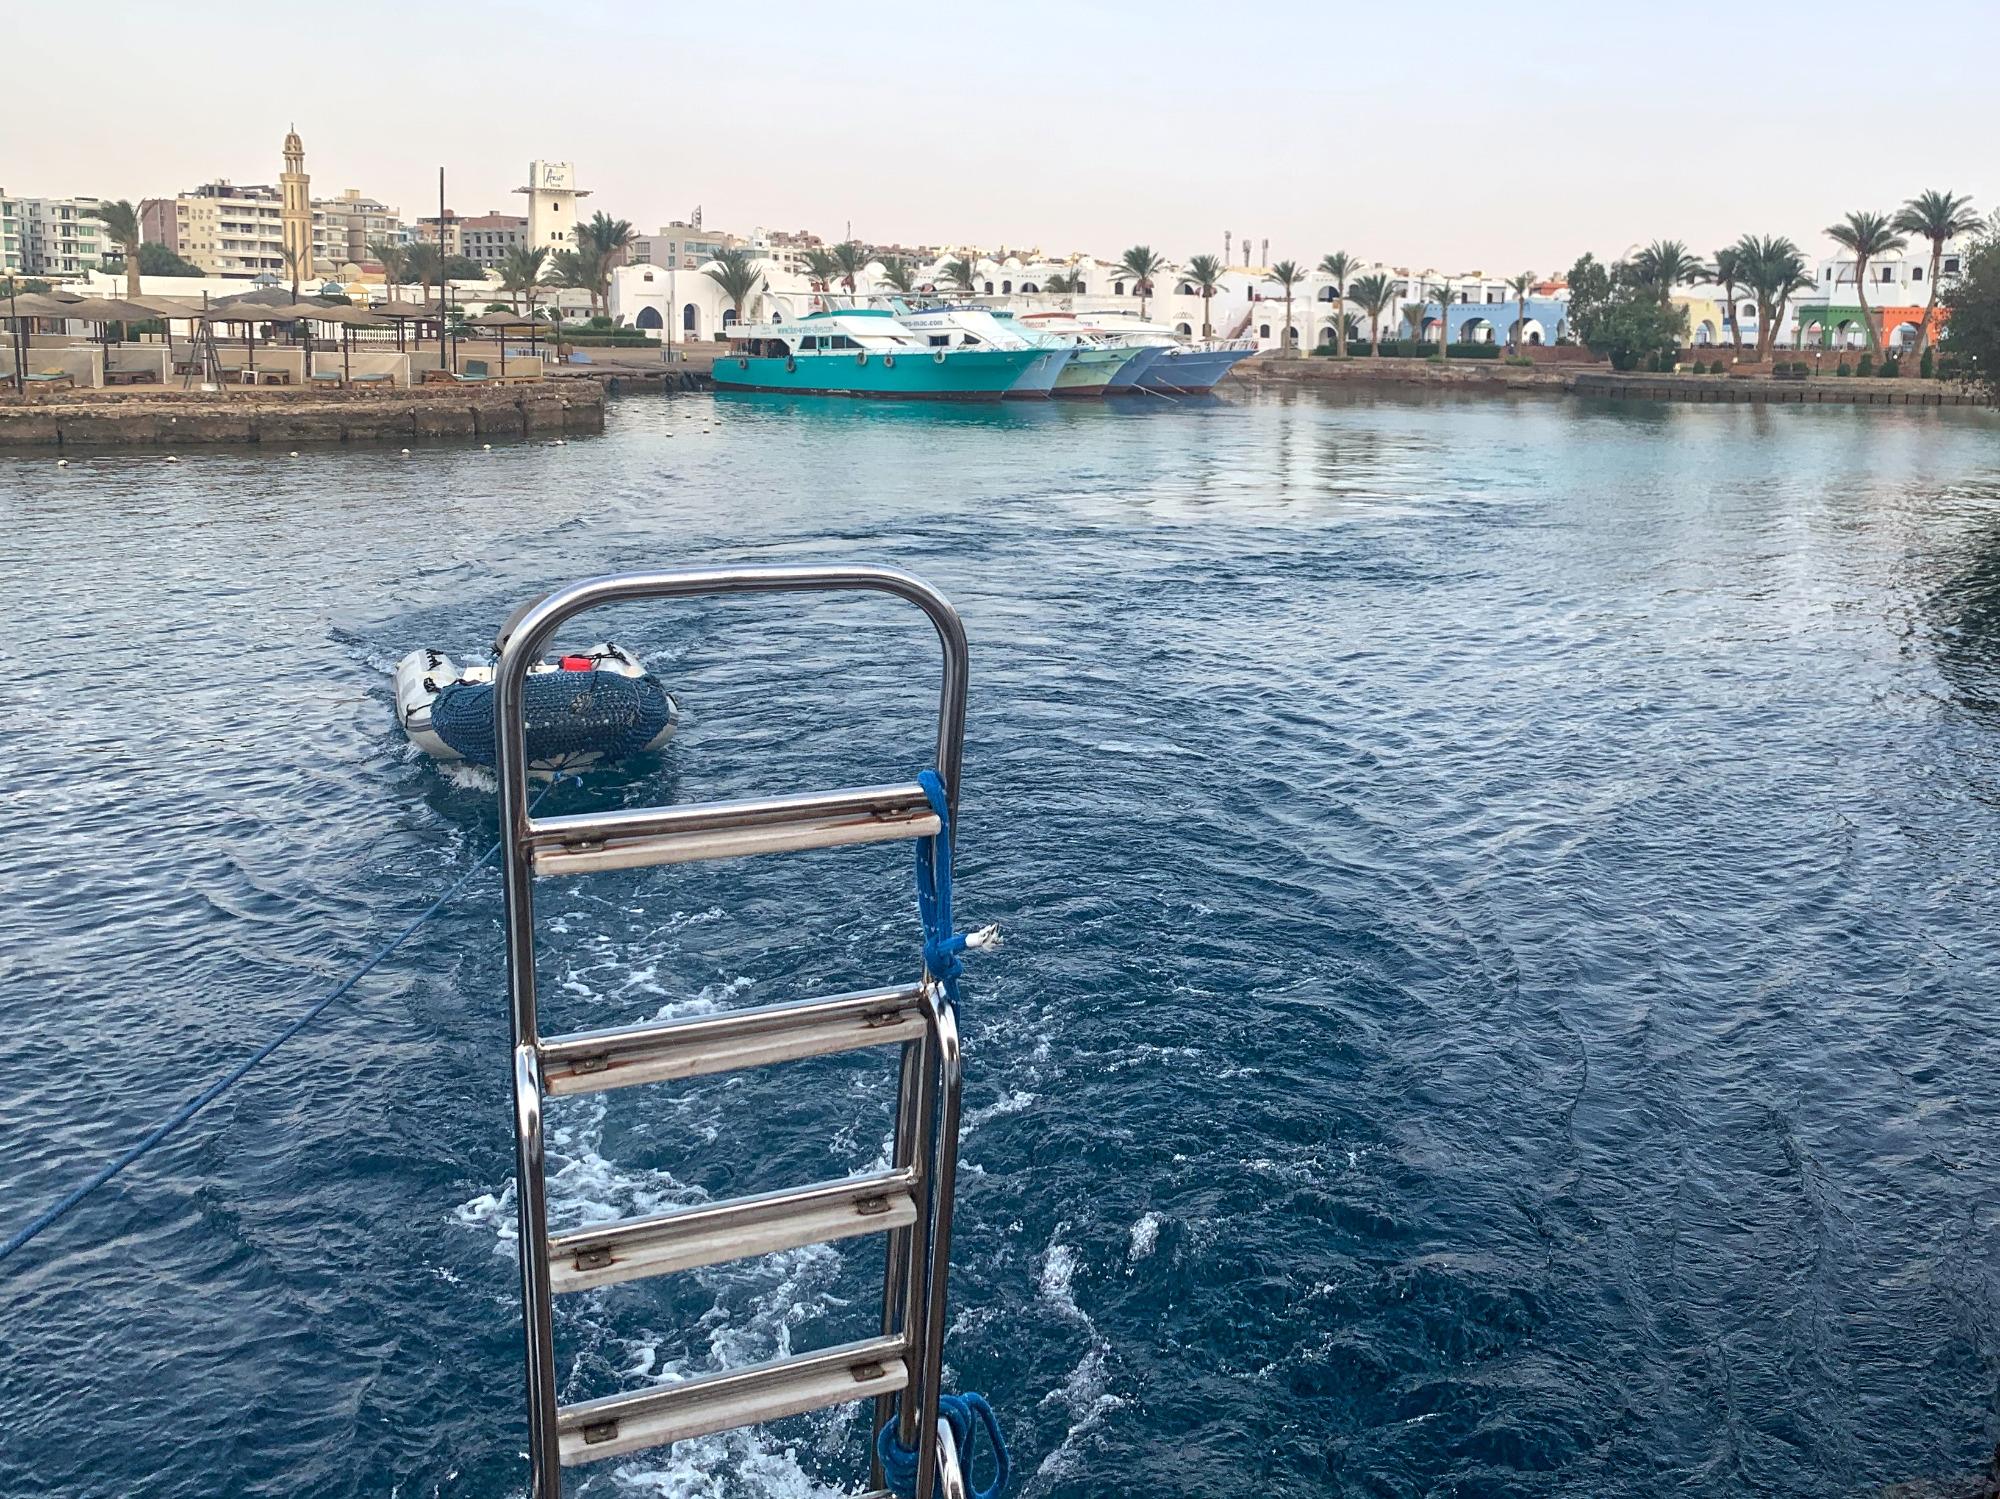 Am Samstag aus Hurghada: Der Rückblick